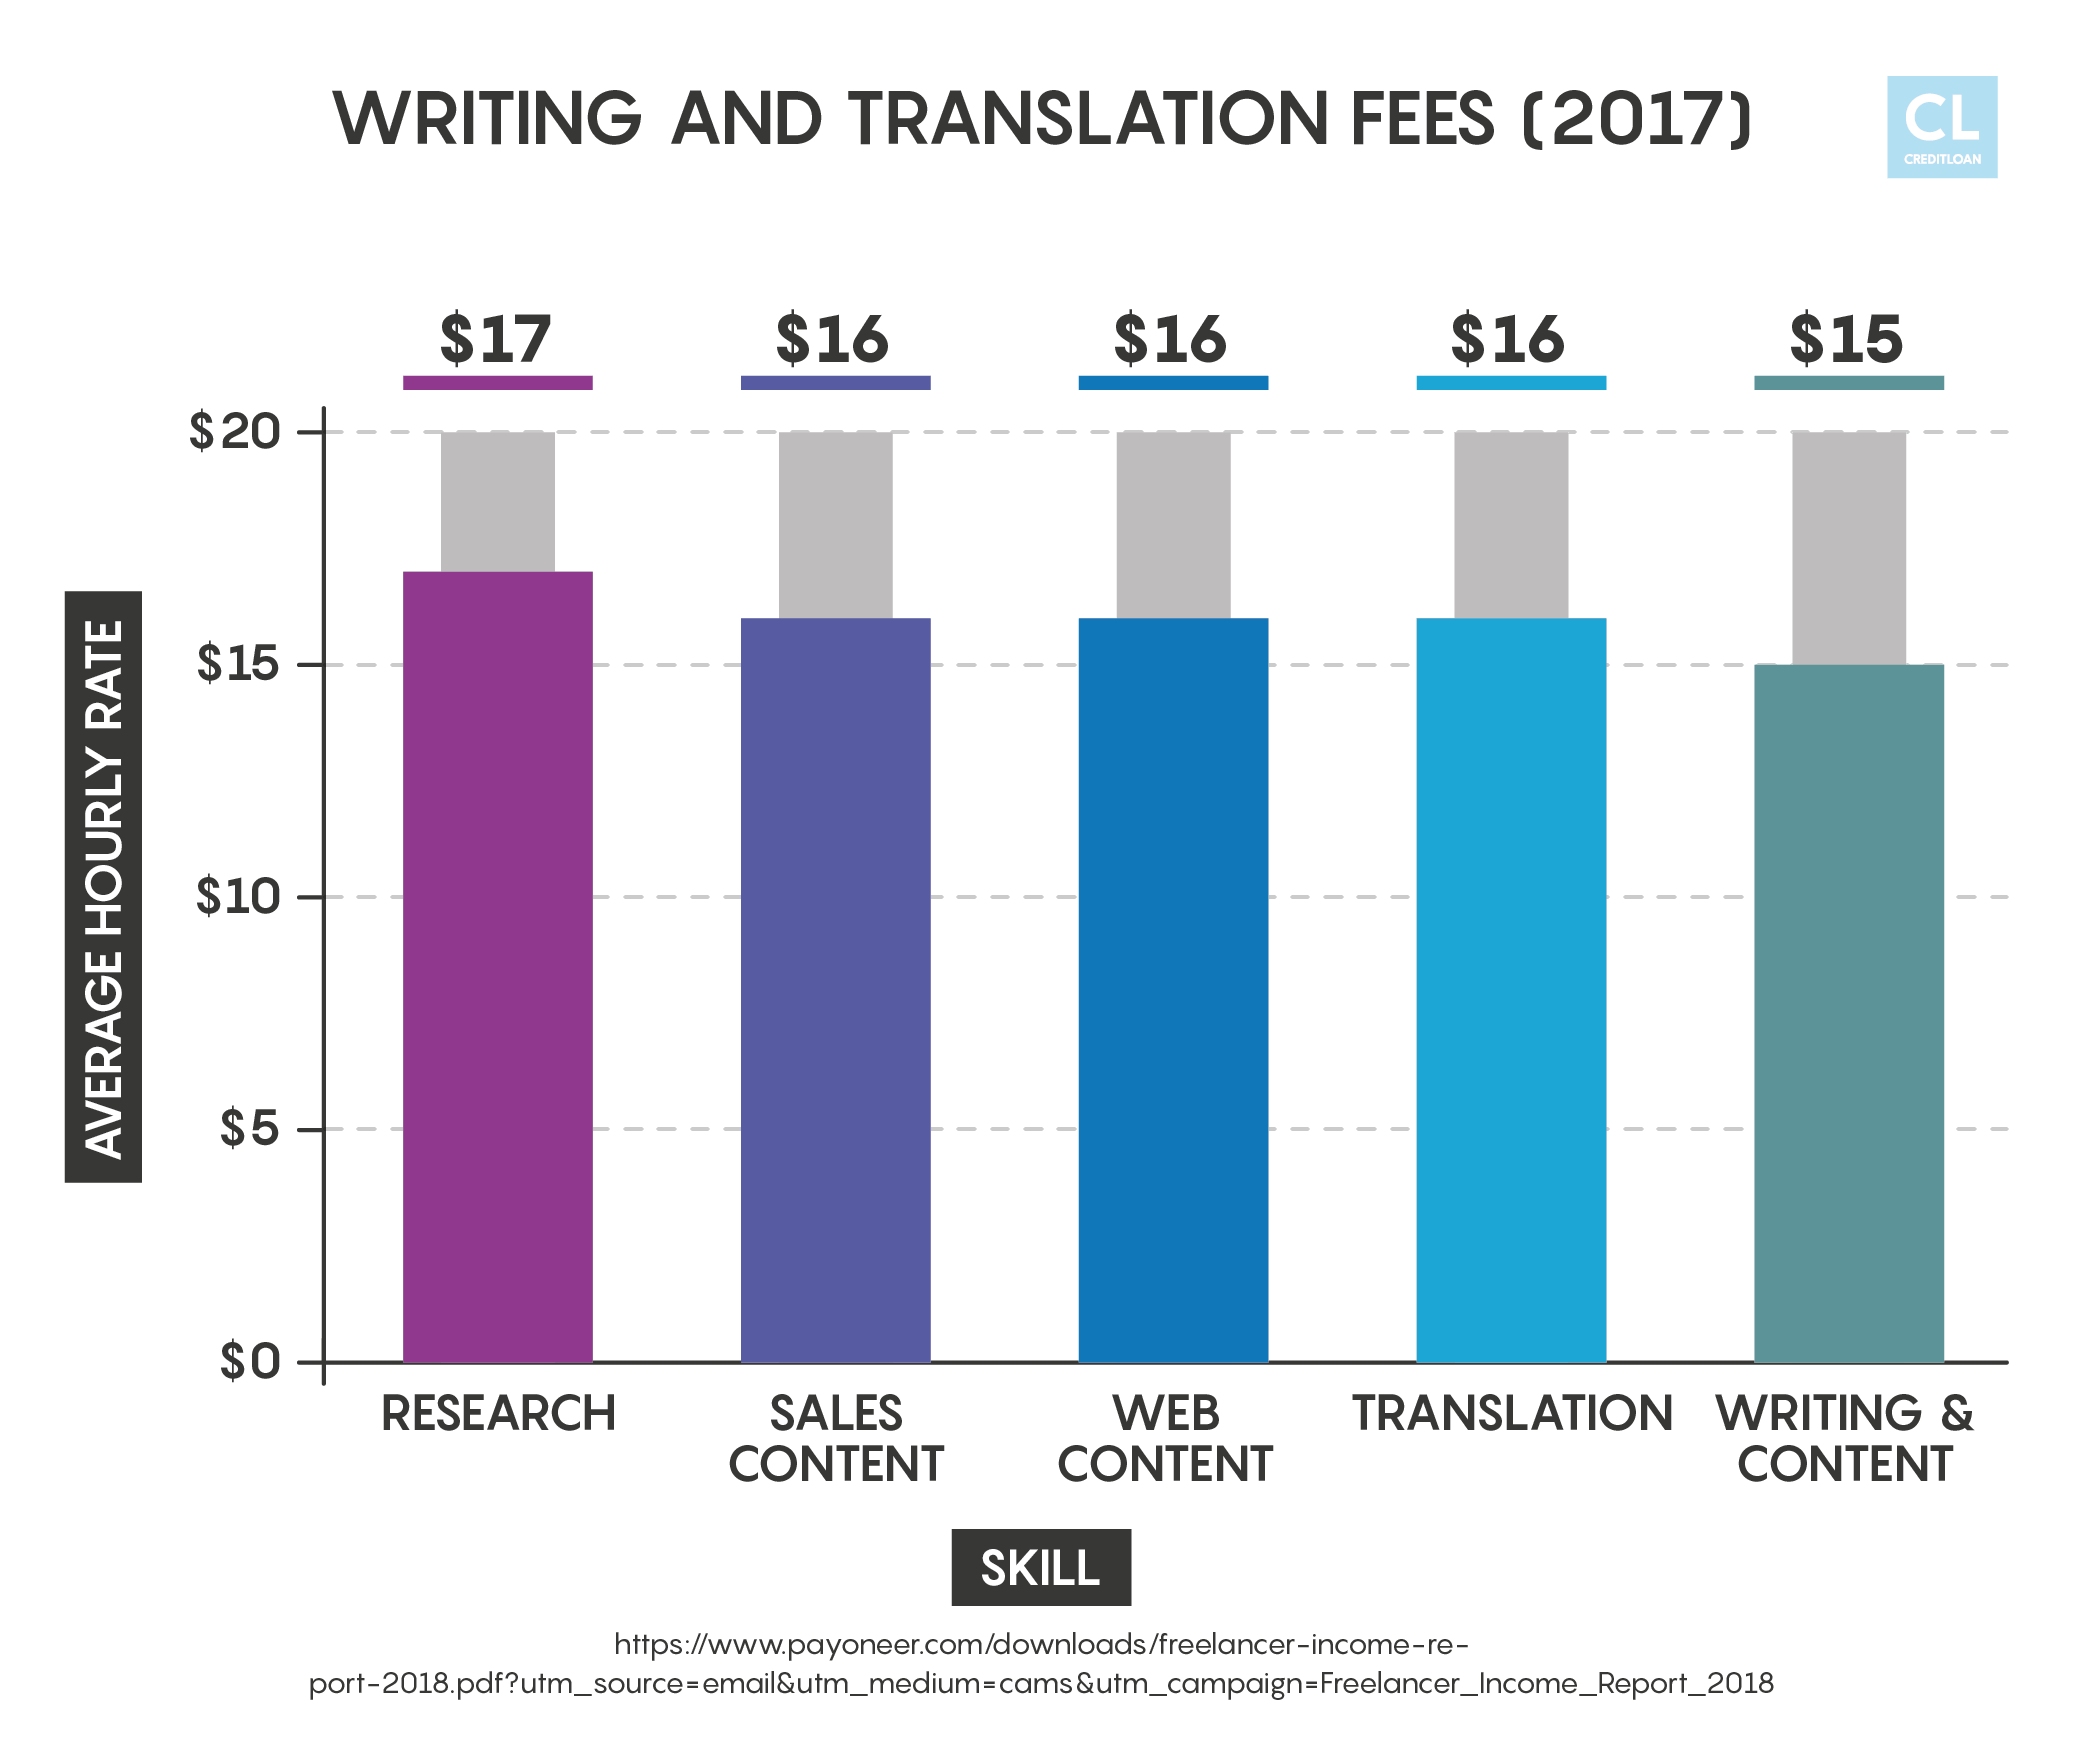 Writing and Translation Fees